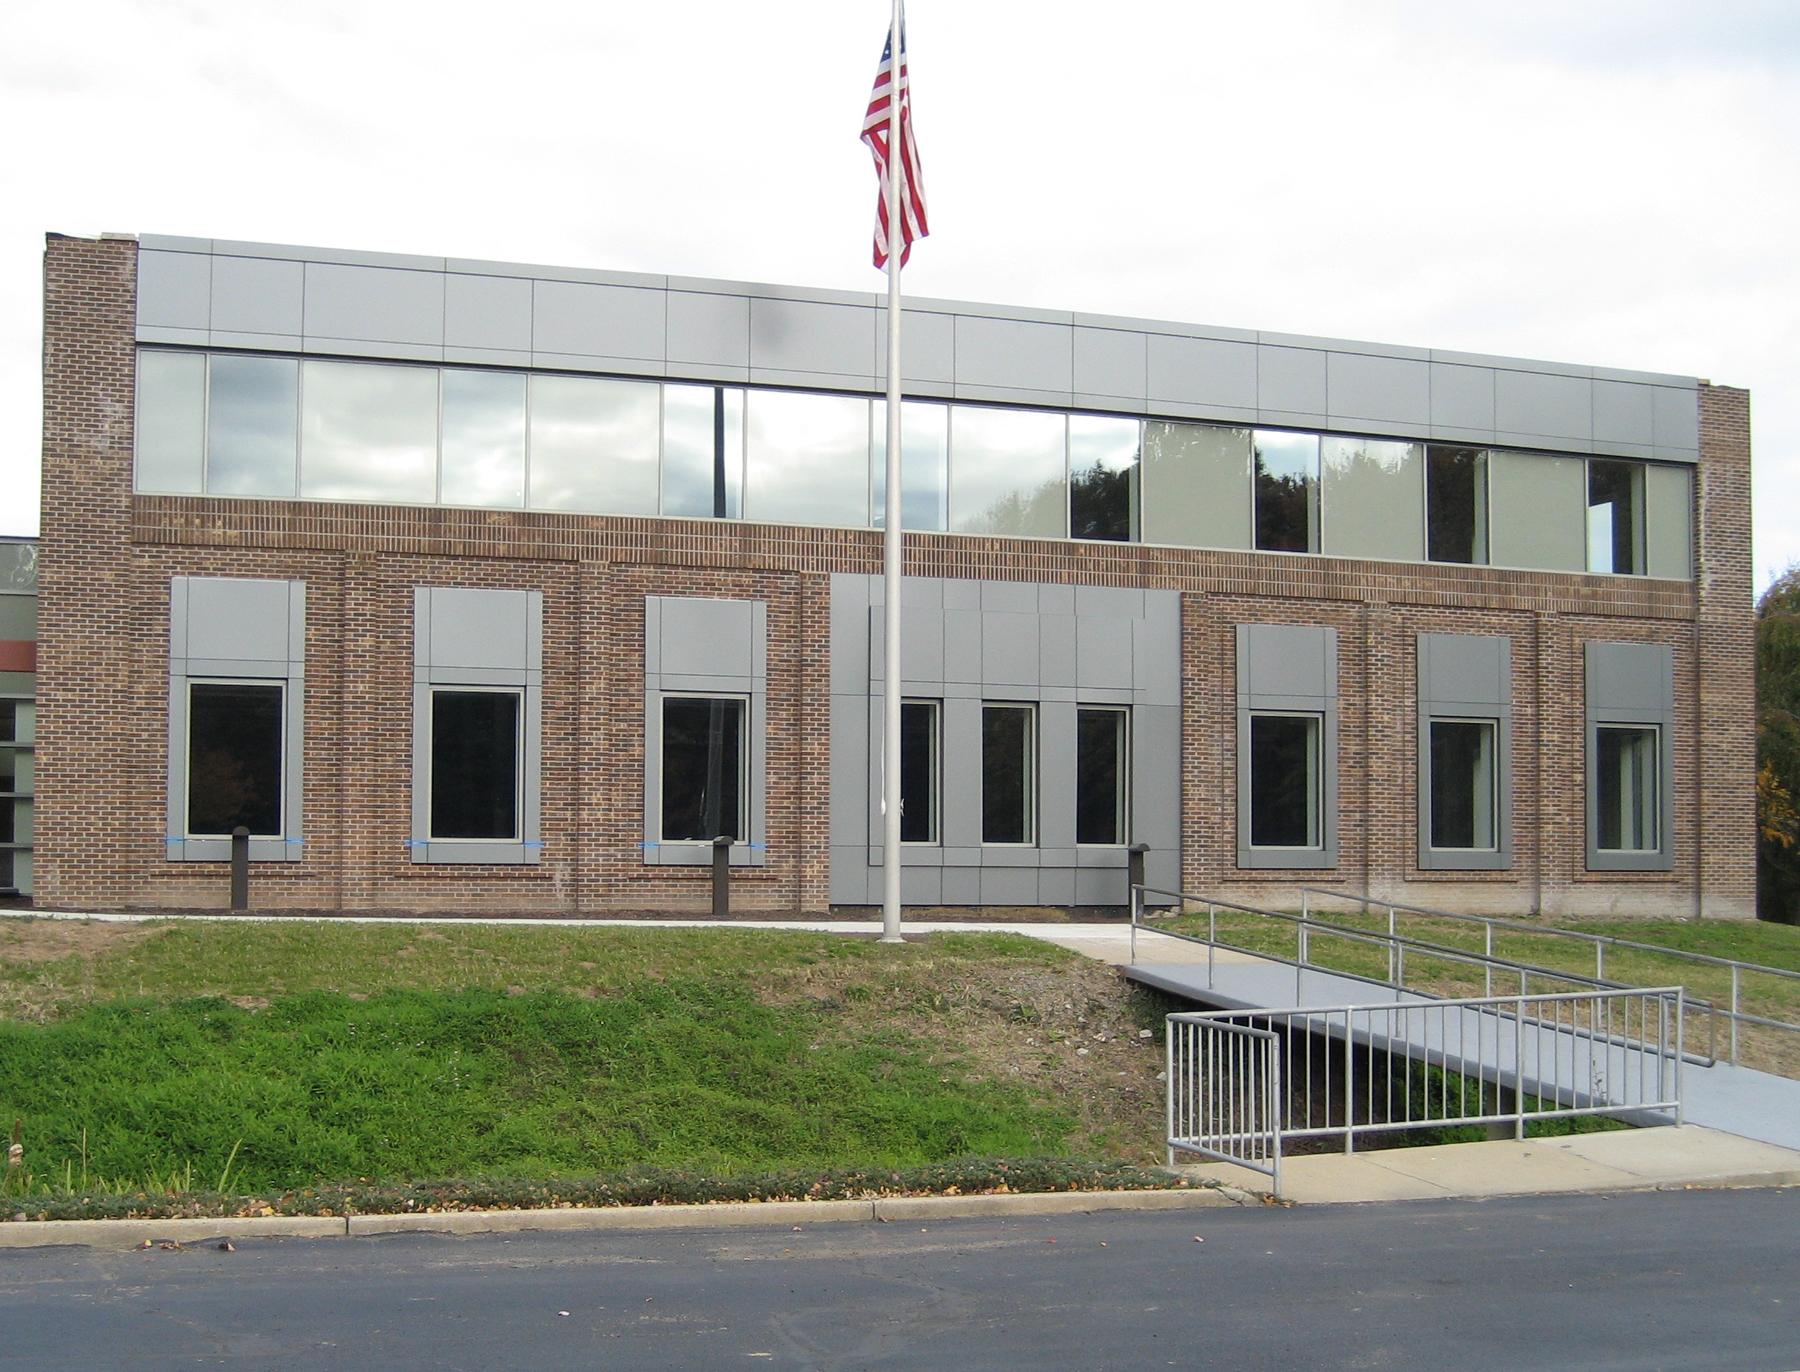 29 Thanet Circle – Princeton, NJ 08540 – 7,500 sq. ft.